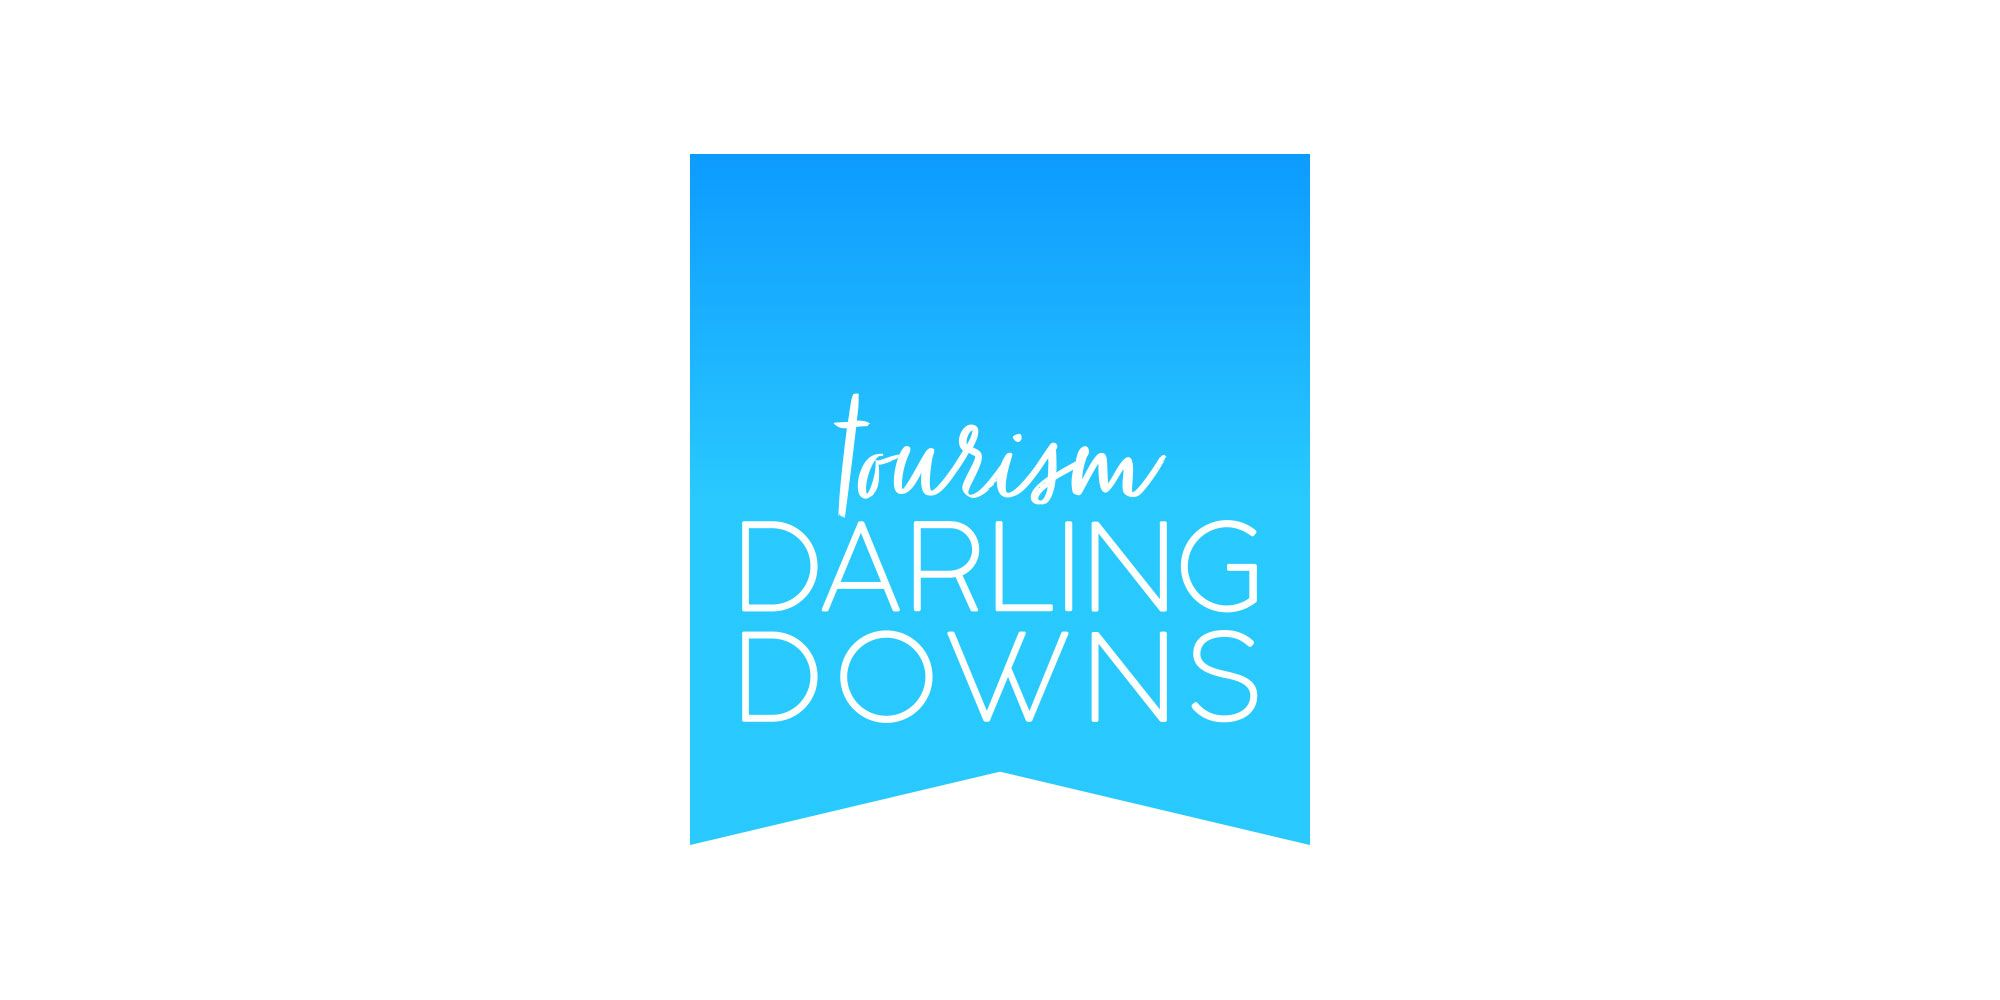 Tourism Darling Downs Logo